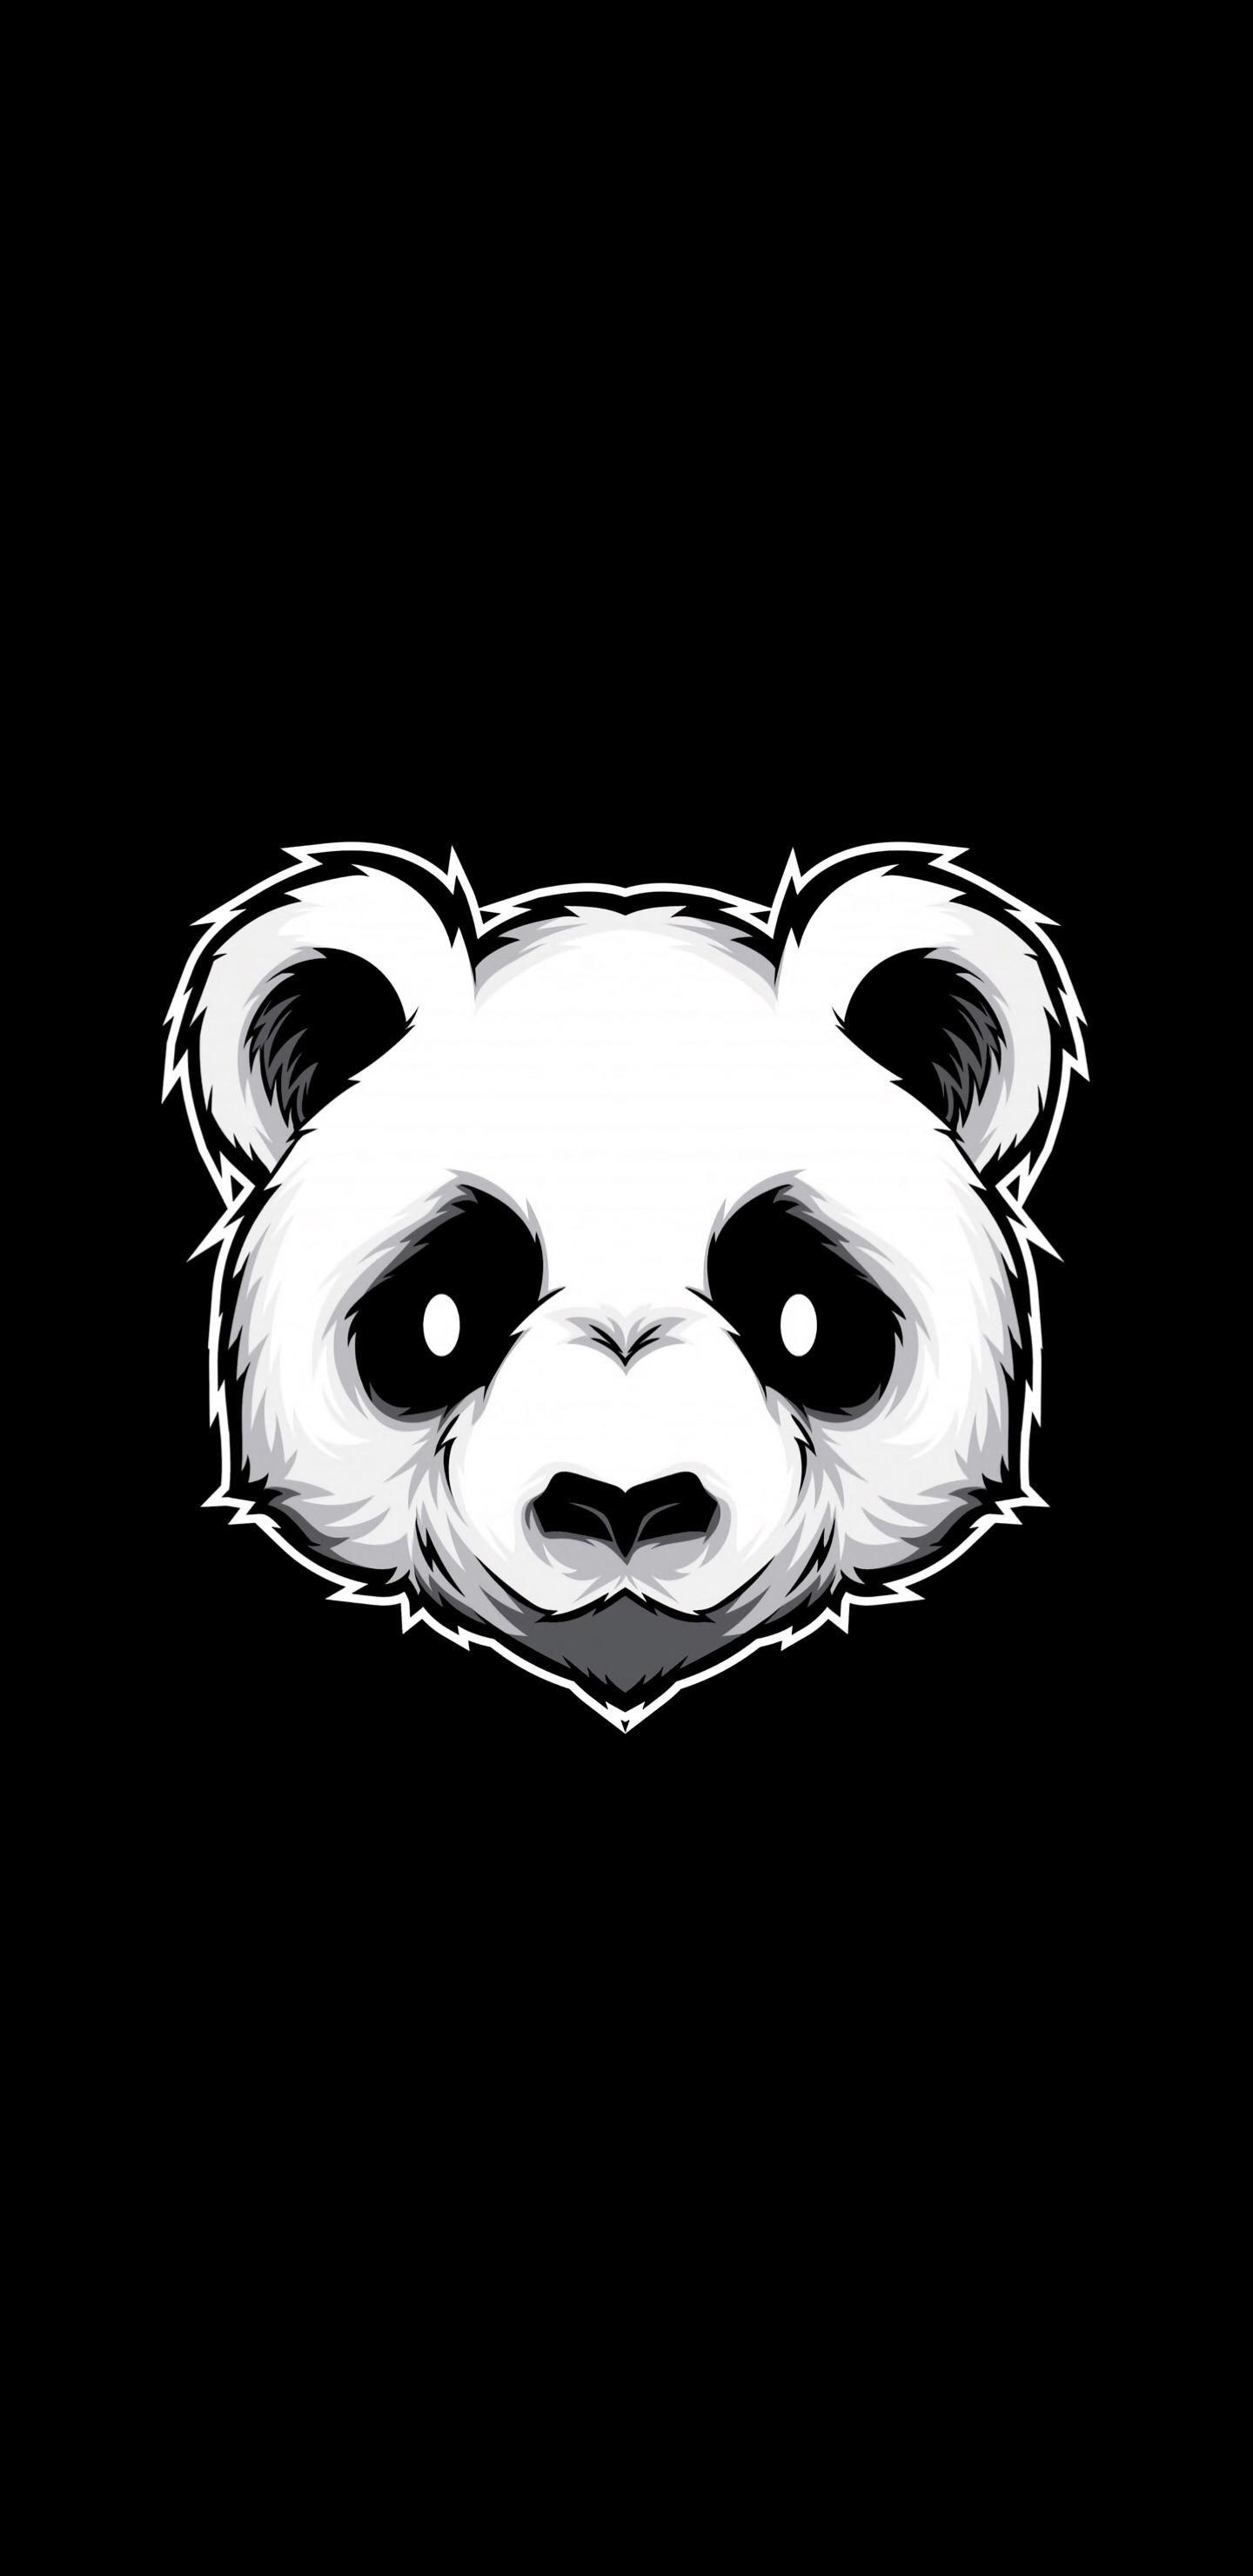 Pin By Bellatrixxph On Iphone Wallpaper Panda Art Wallpaper Amoled Graffiti Wallpaper Cute black panda wallpaper